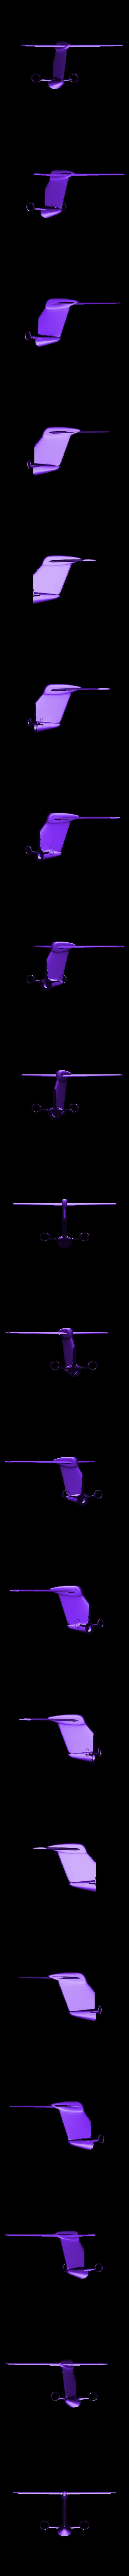 Tail.stl Download STL file Replica Gulfstream G650 3D print model • 3D print design, Eduardohbm